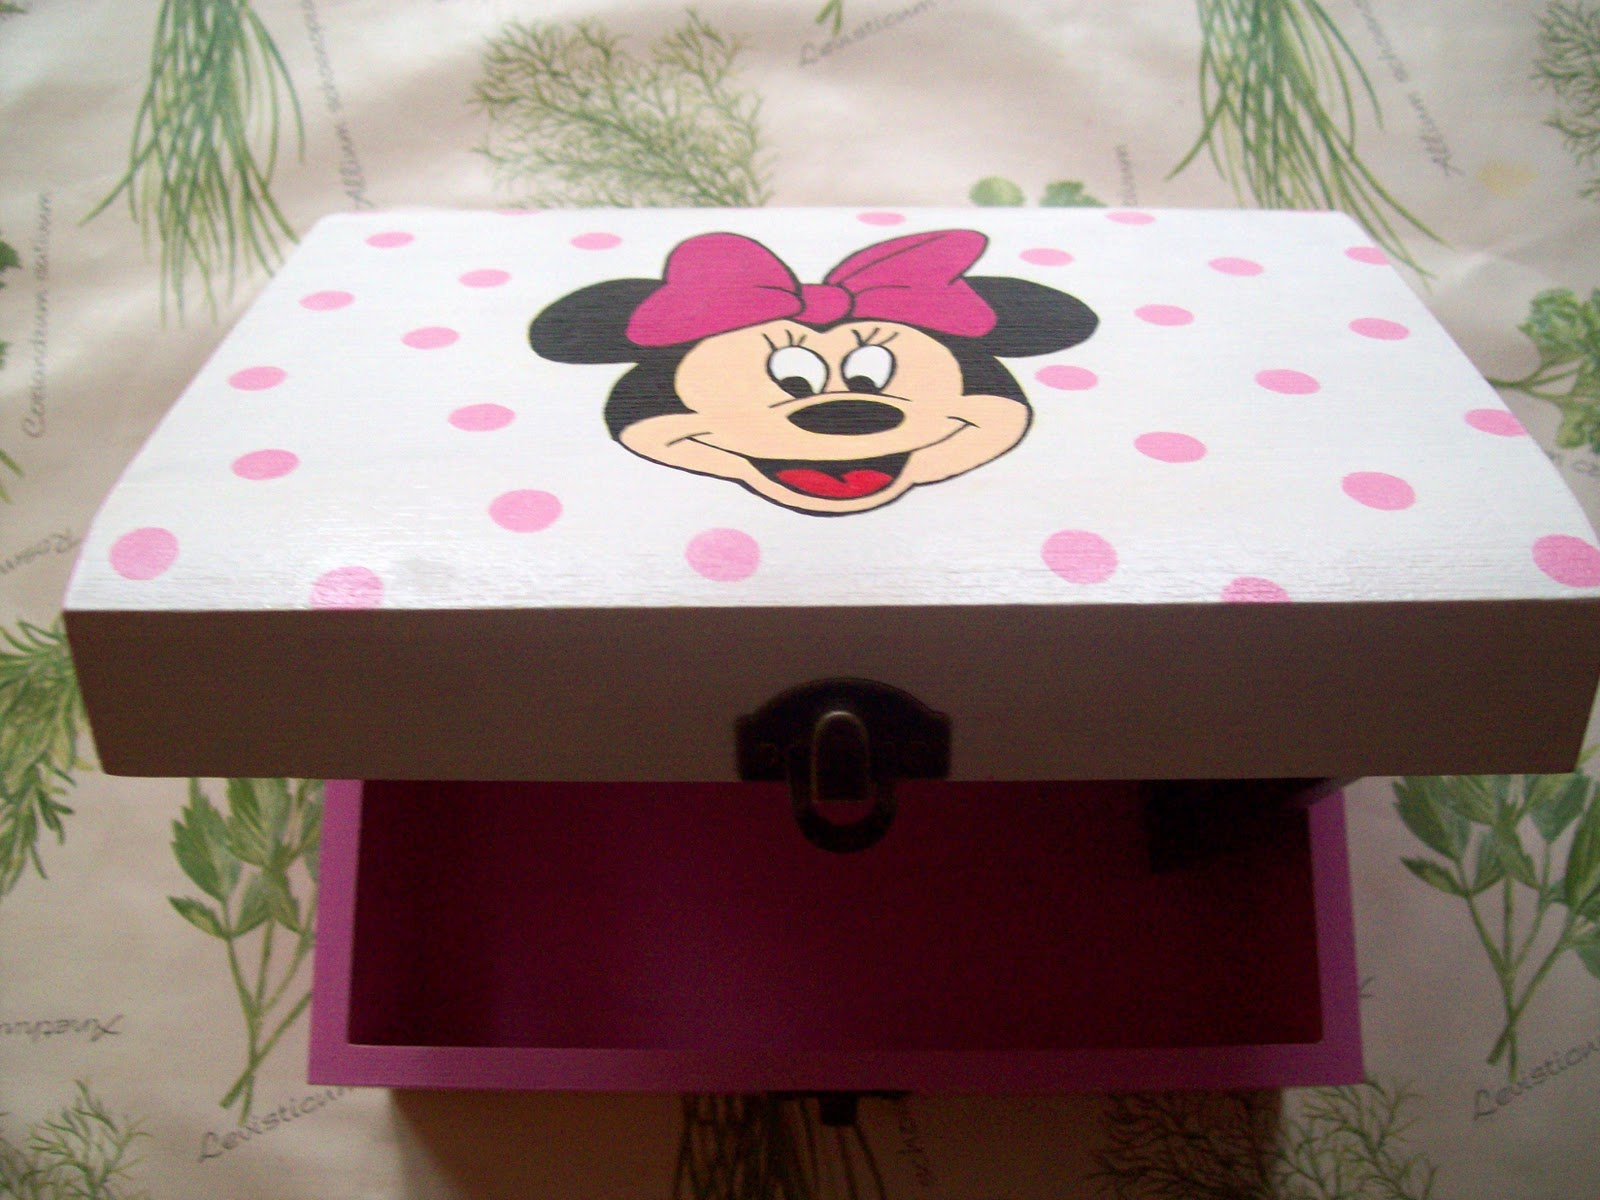 Cajas decoradas infantiles imagui - Cajas infantiles decoradas ...